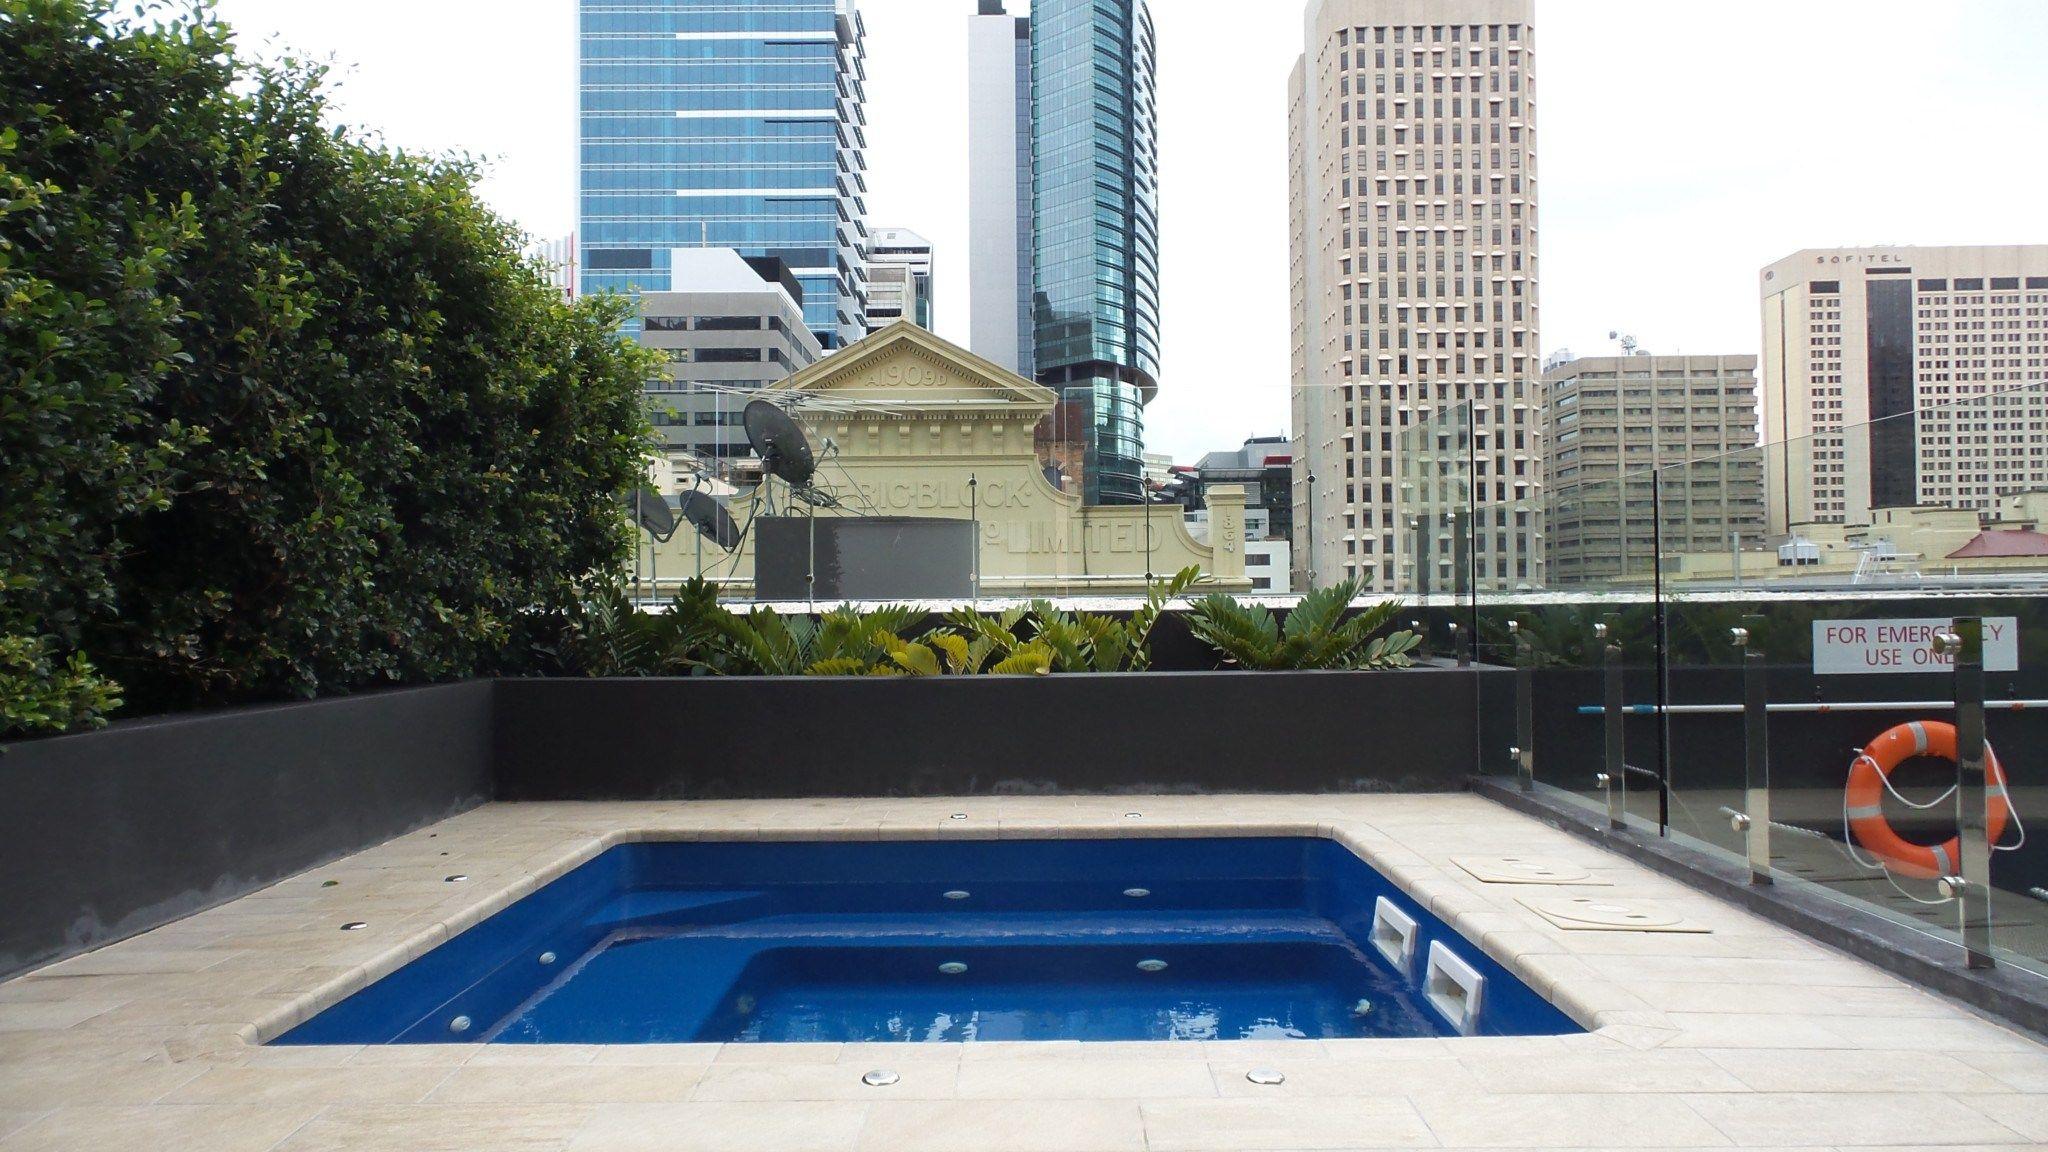 Pool Spa at the Hilton Brisbane Hotel